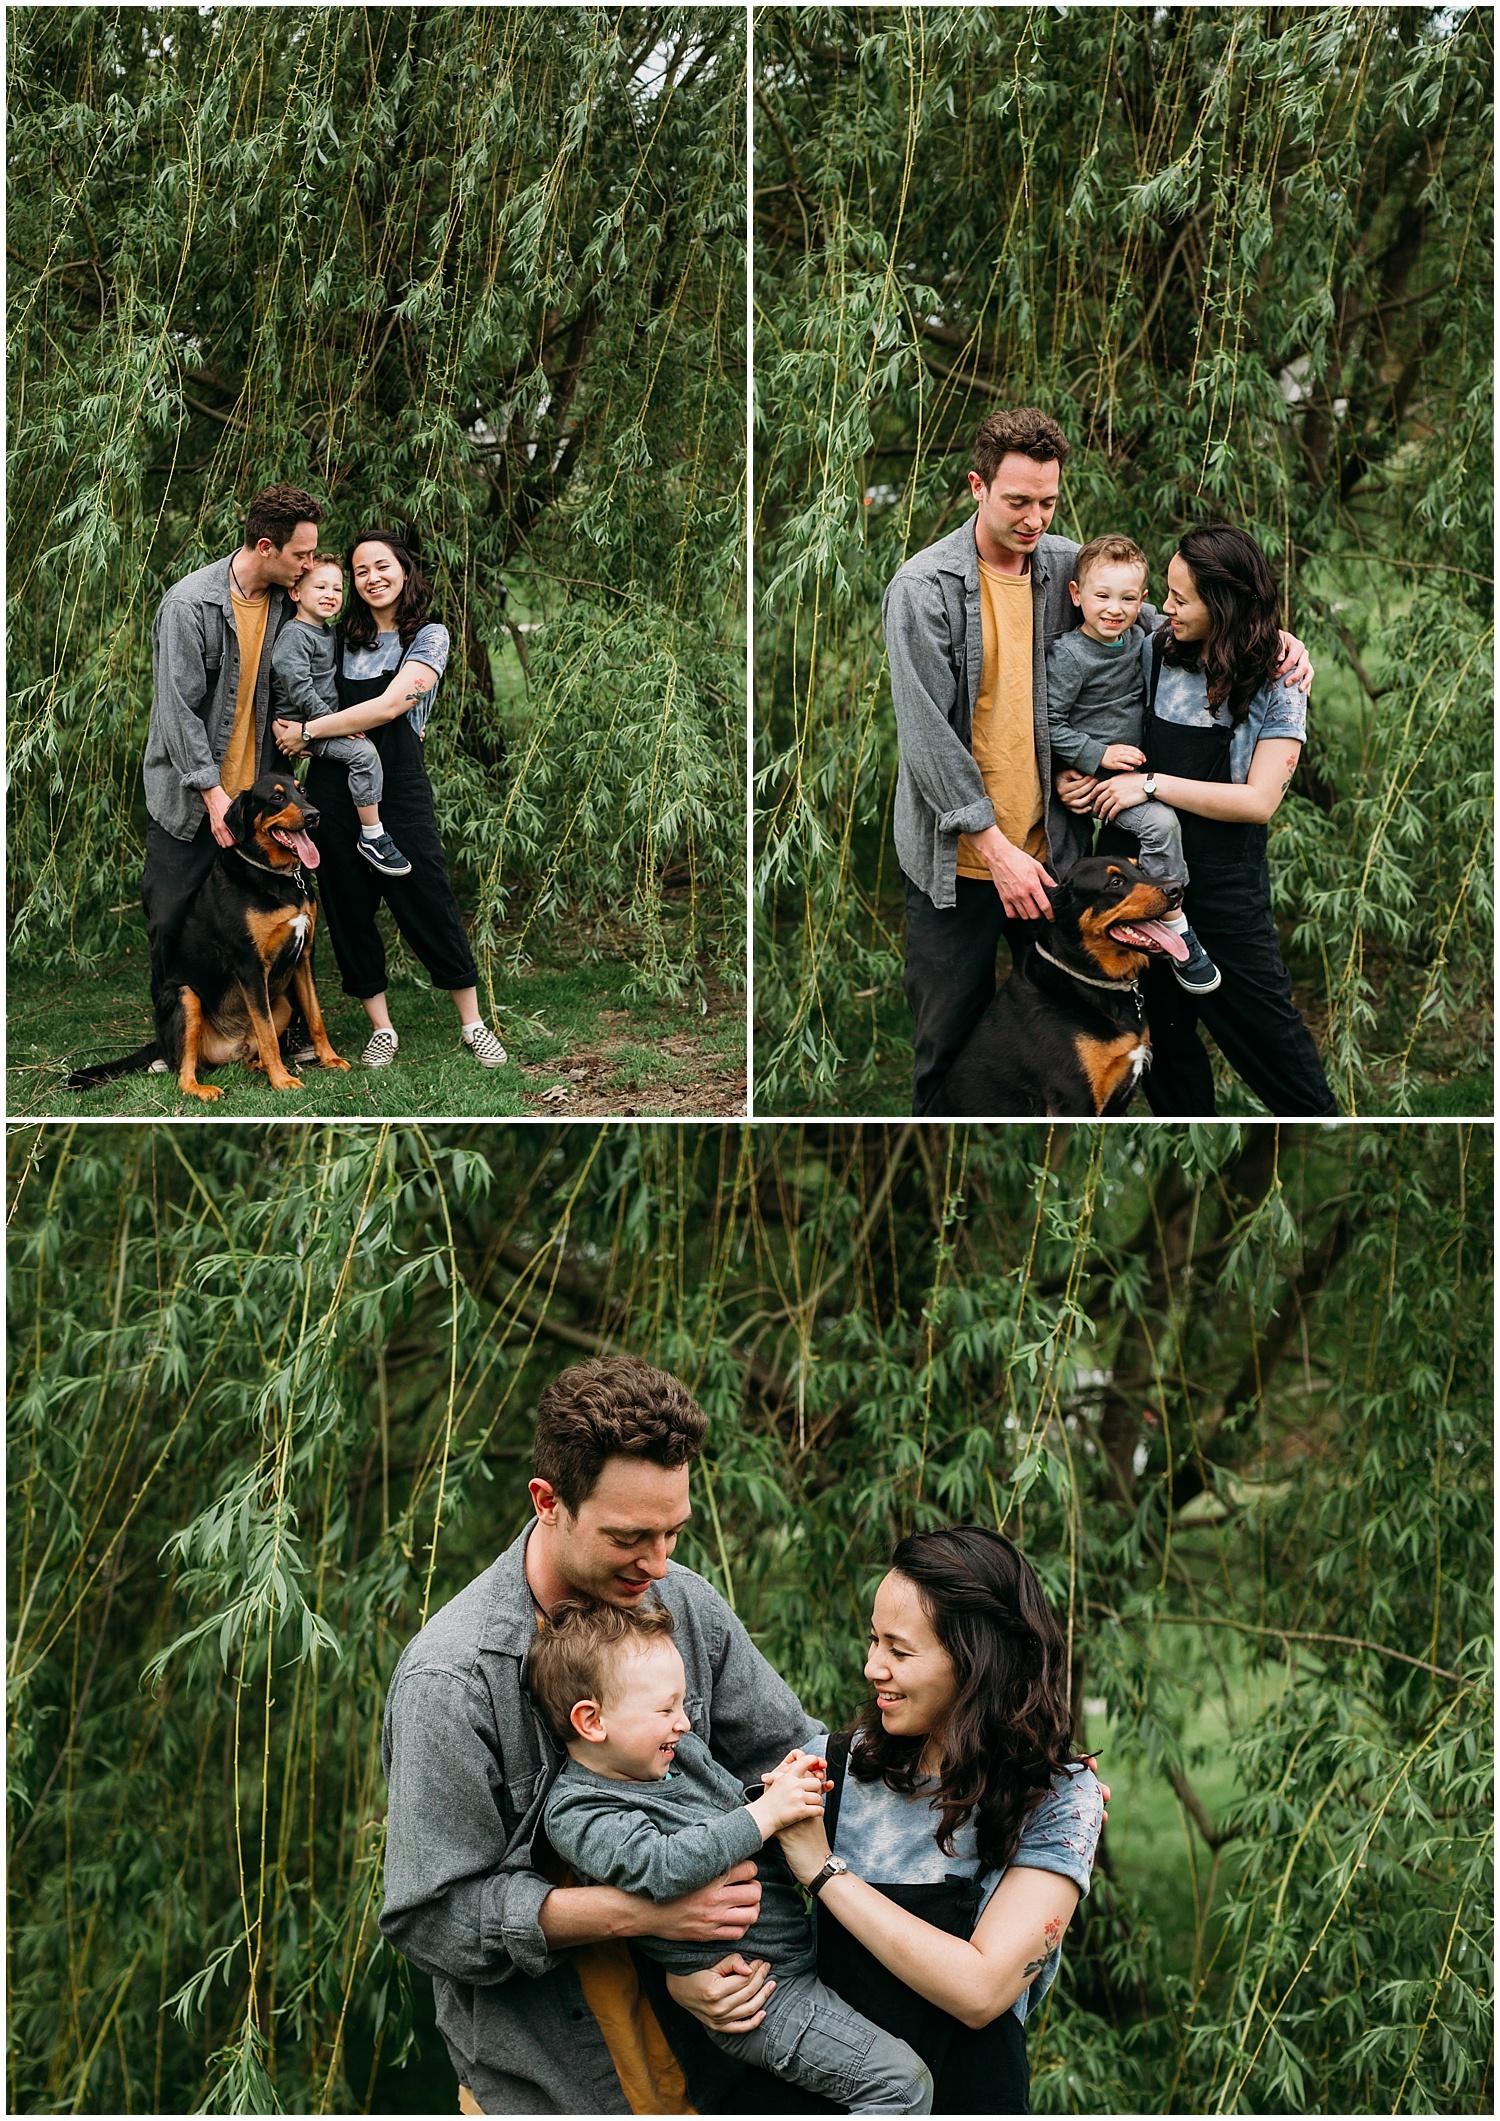 collingswood-new-jersey-motherhood-mini-photo-session_0014.jpg